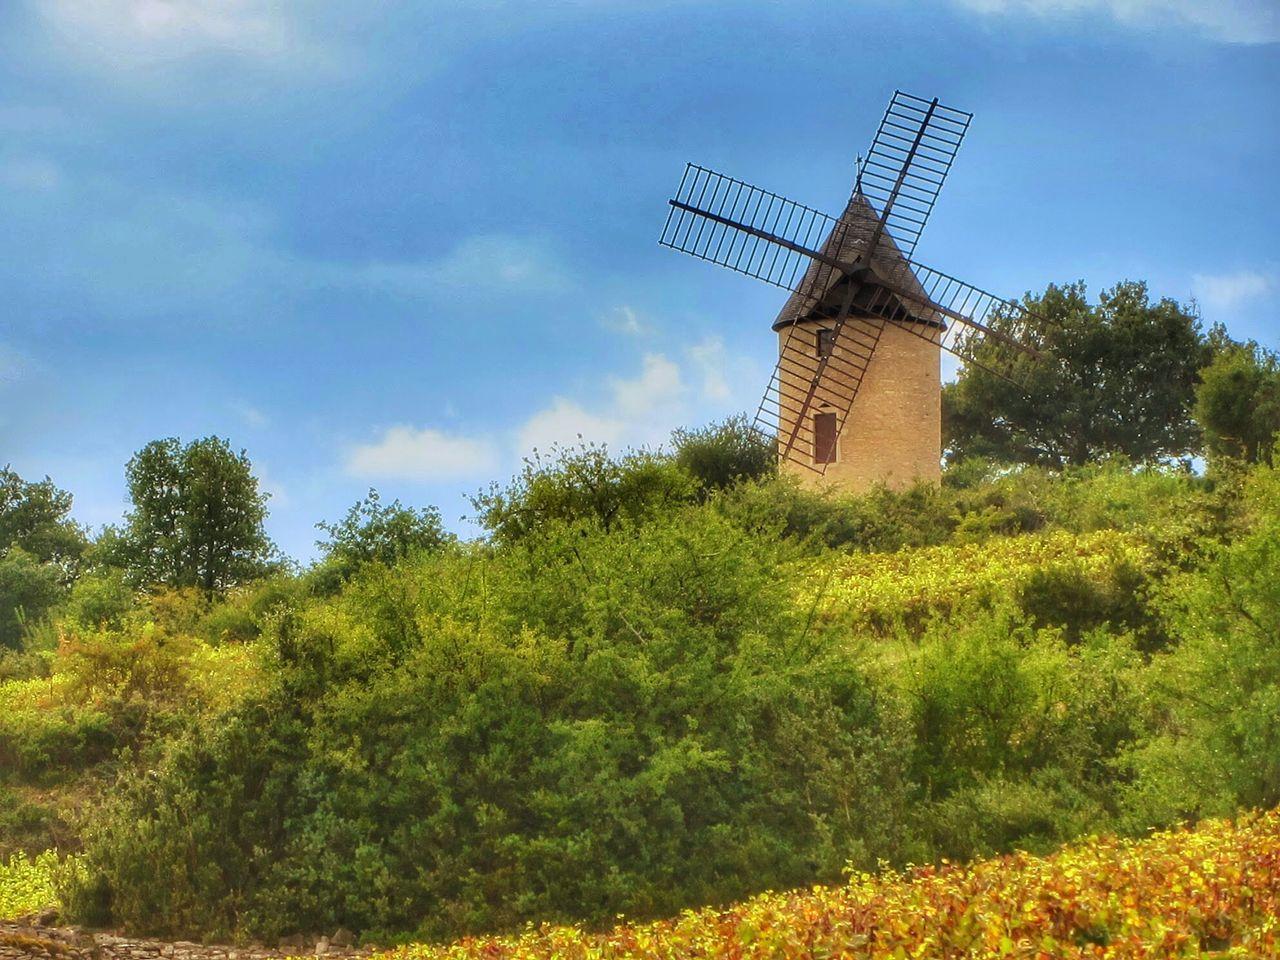 Moulin à Vent Windmill Montrachet France Travelphotography Traveling Travel Travel Destinations